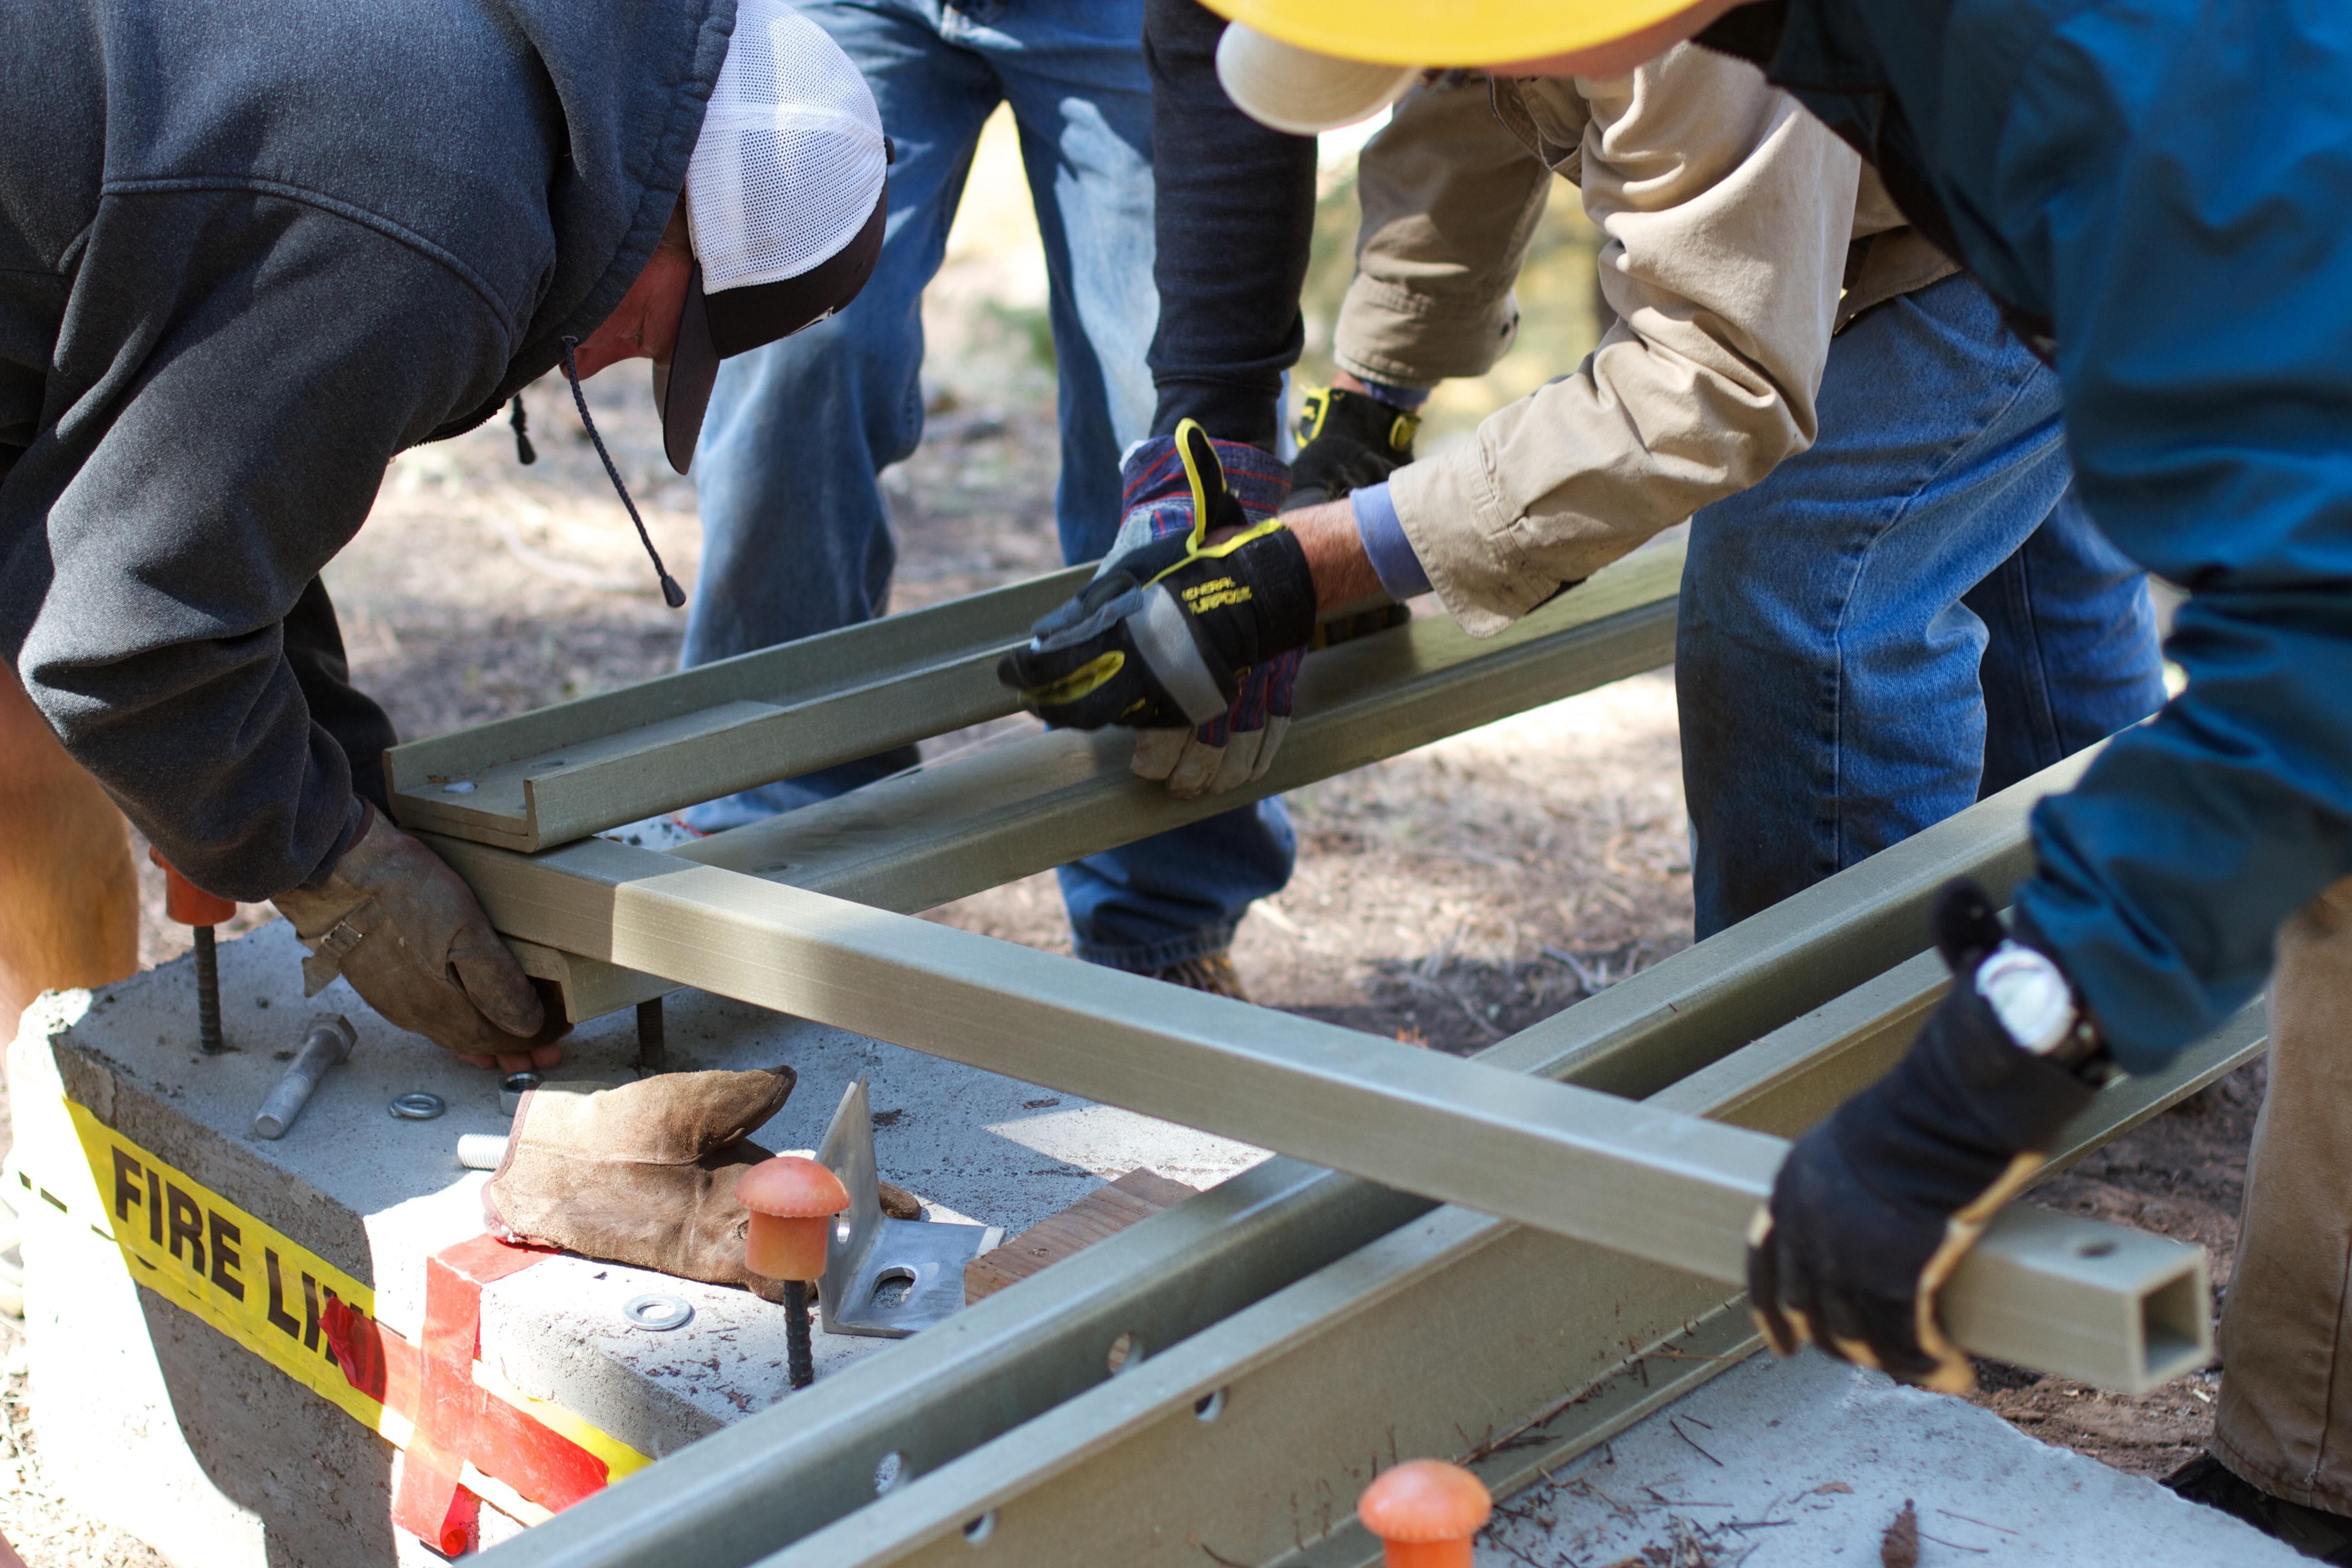 machine manufacturing pstrails laborer construction worker